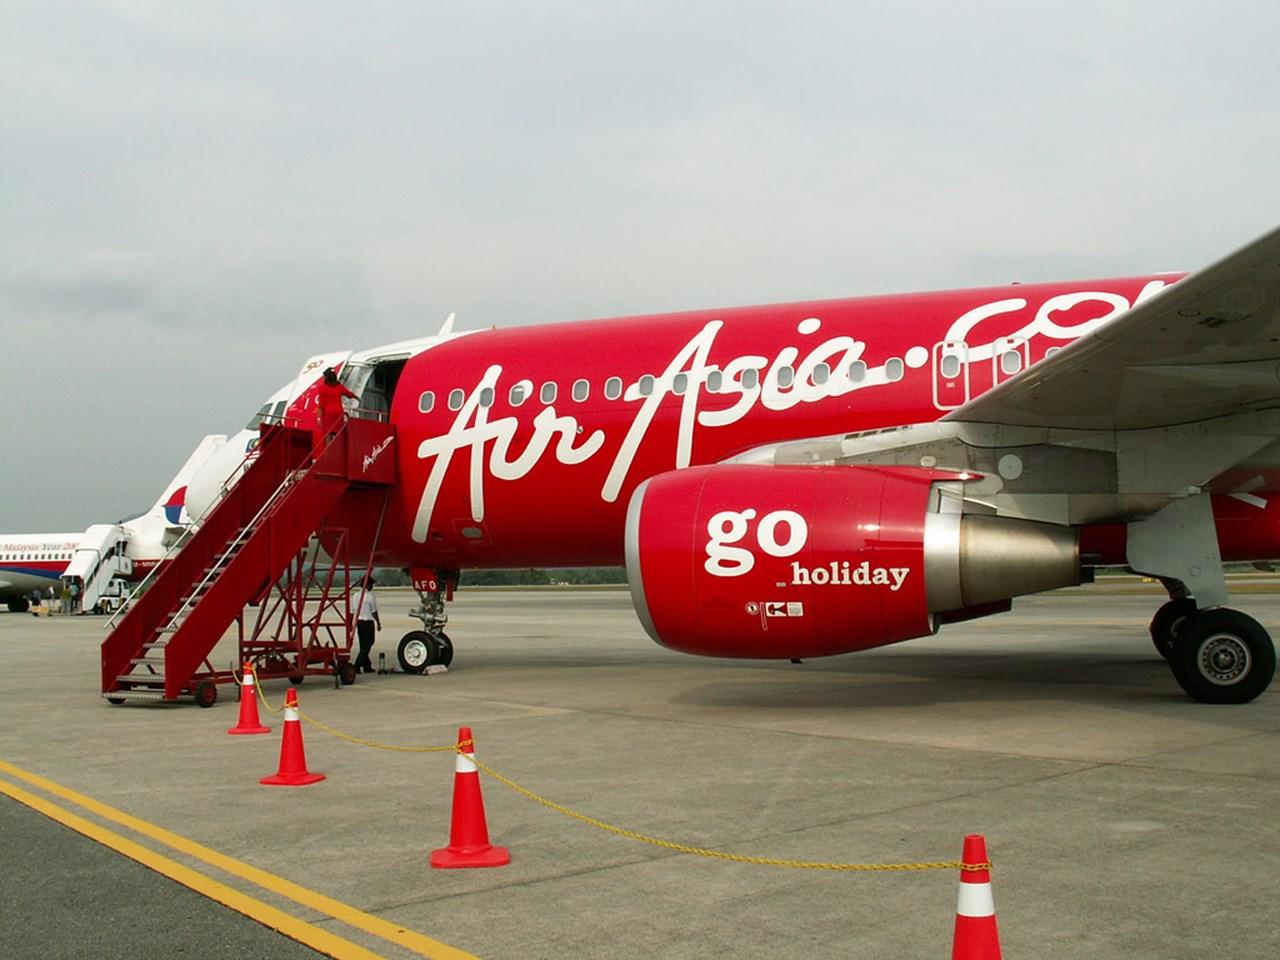 AirAsia India flight delayed; passenger complains of ill treatment